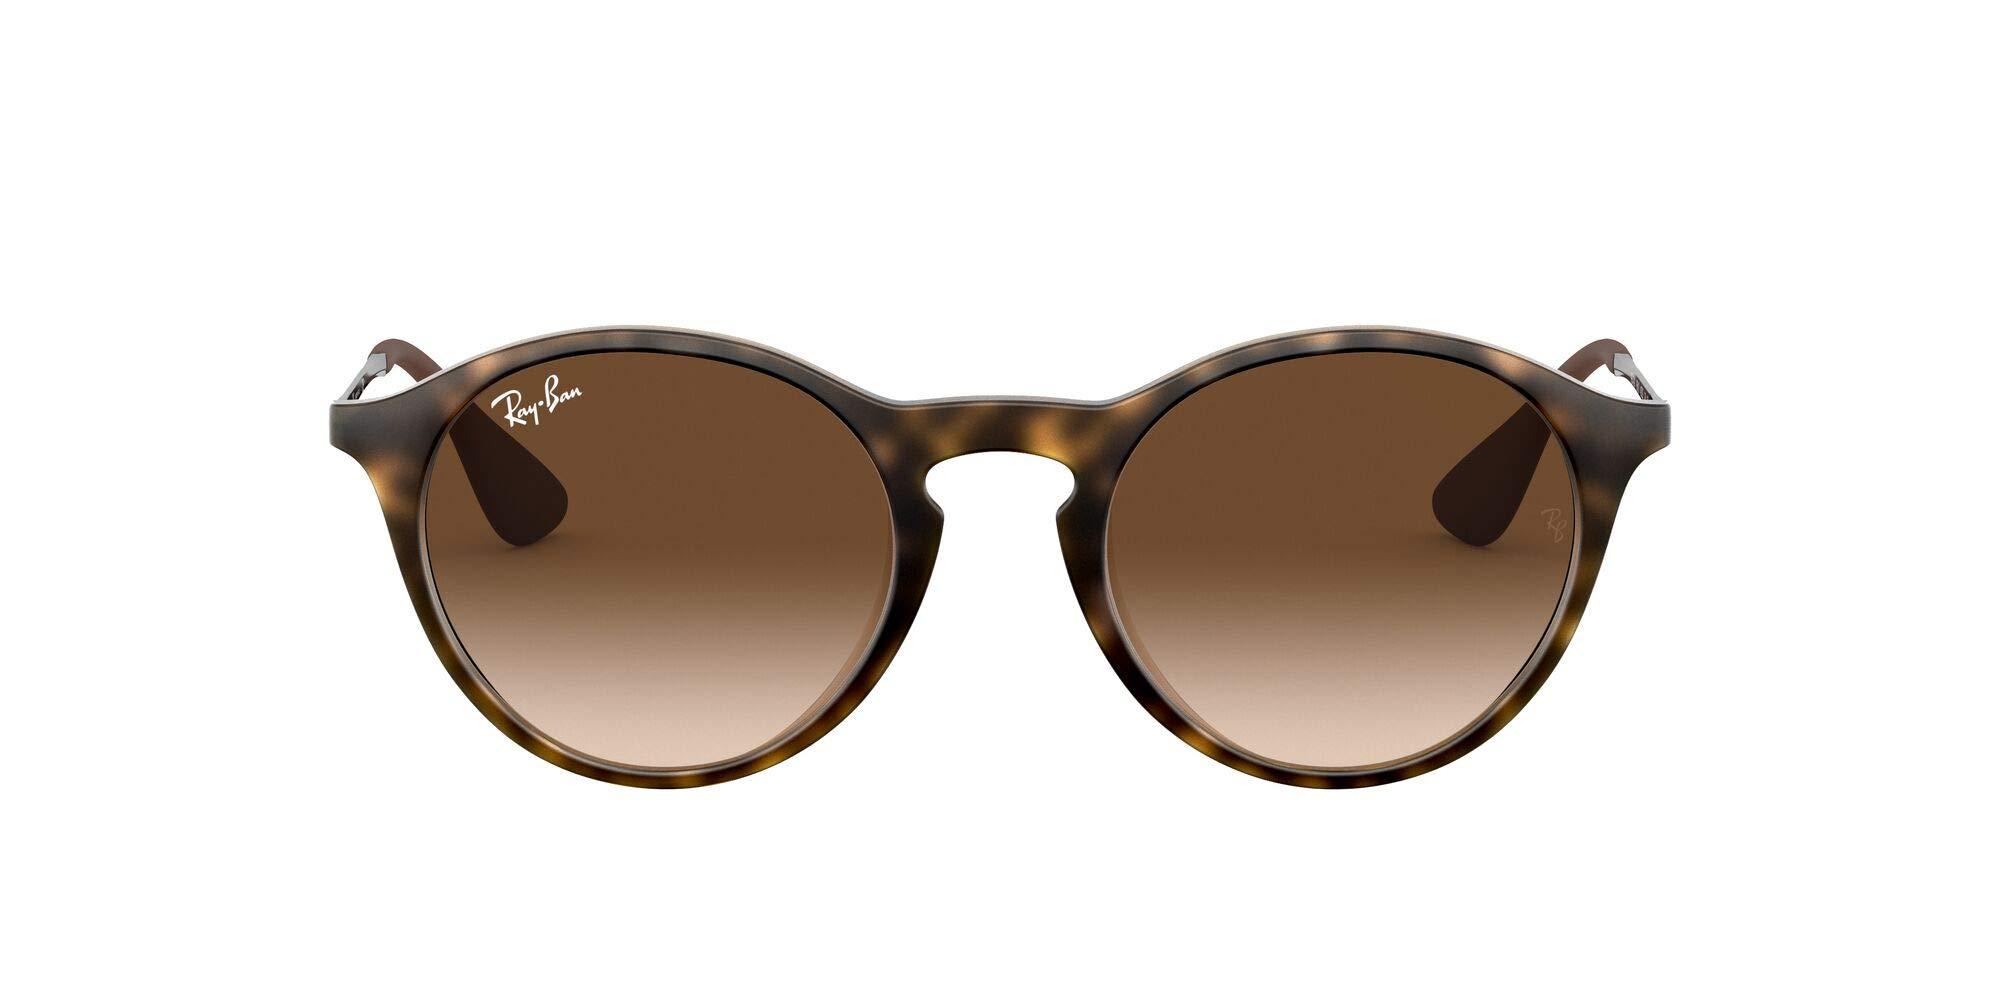 Ray-Ban unisex-adult Rb4243 Round Sunglasses Round Sunglasses